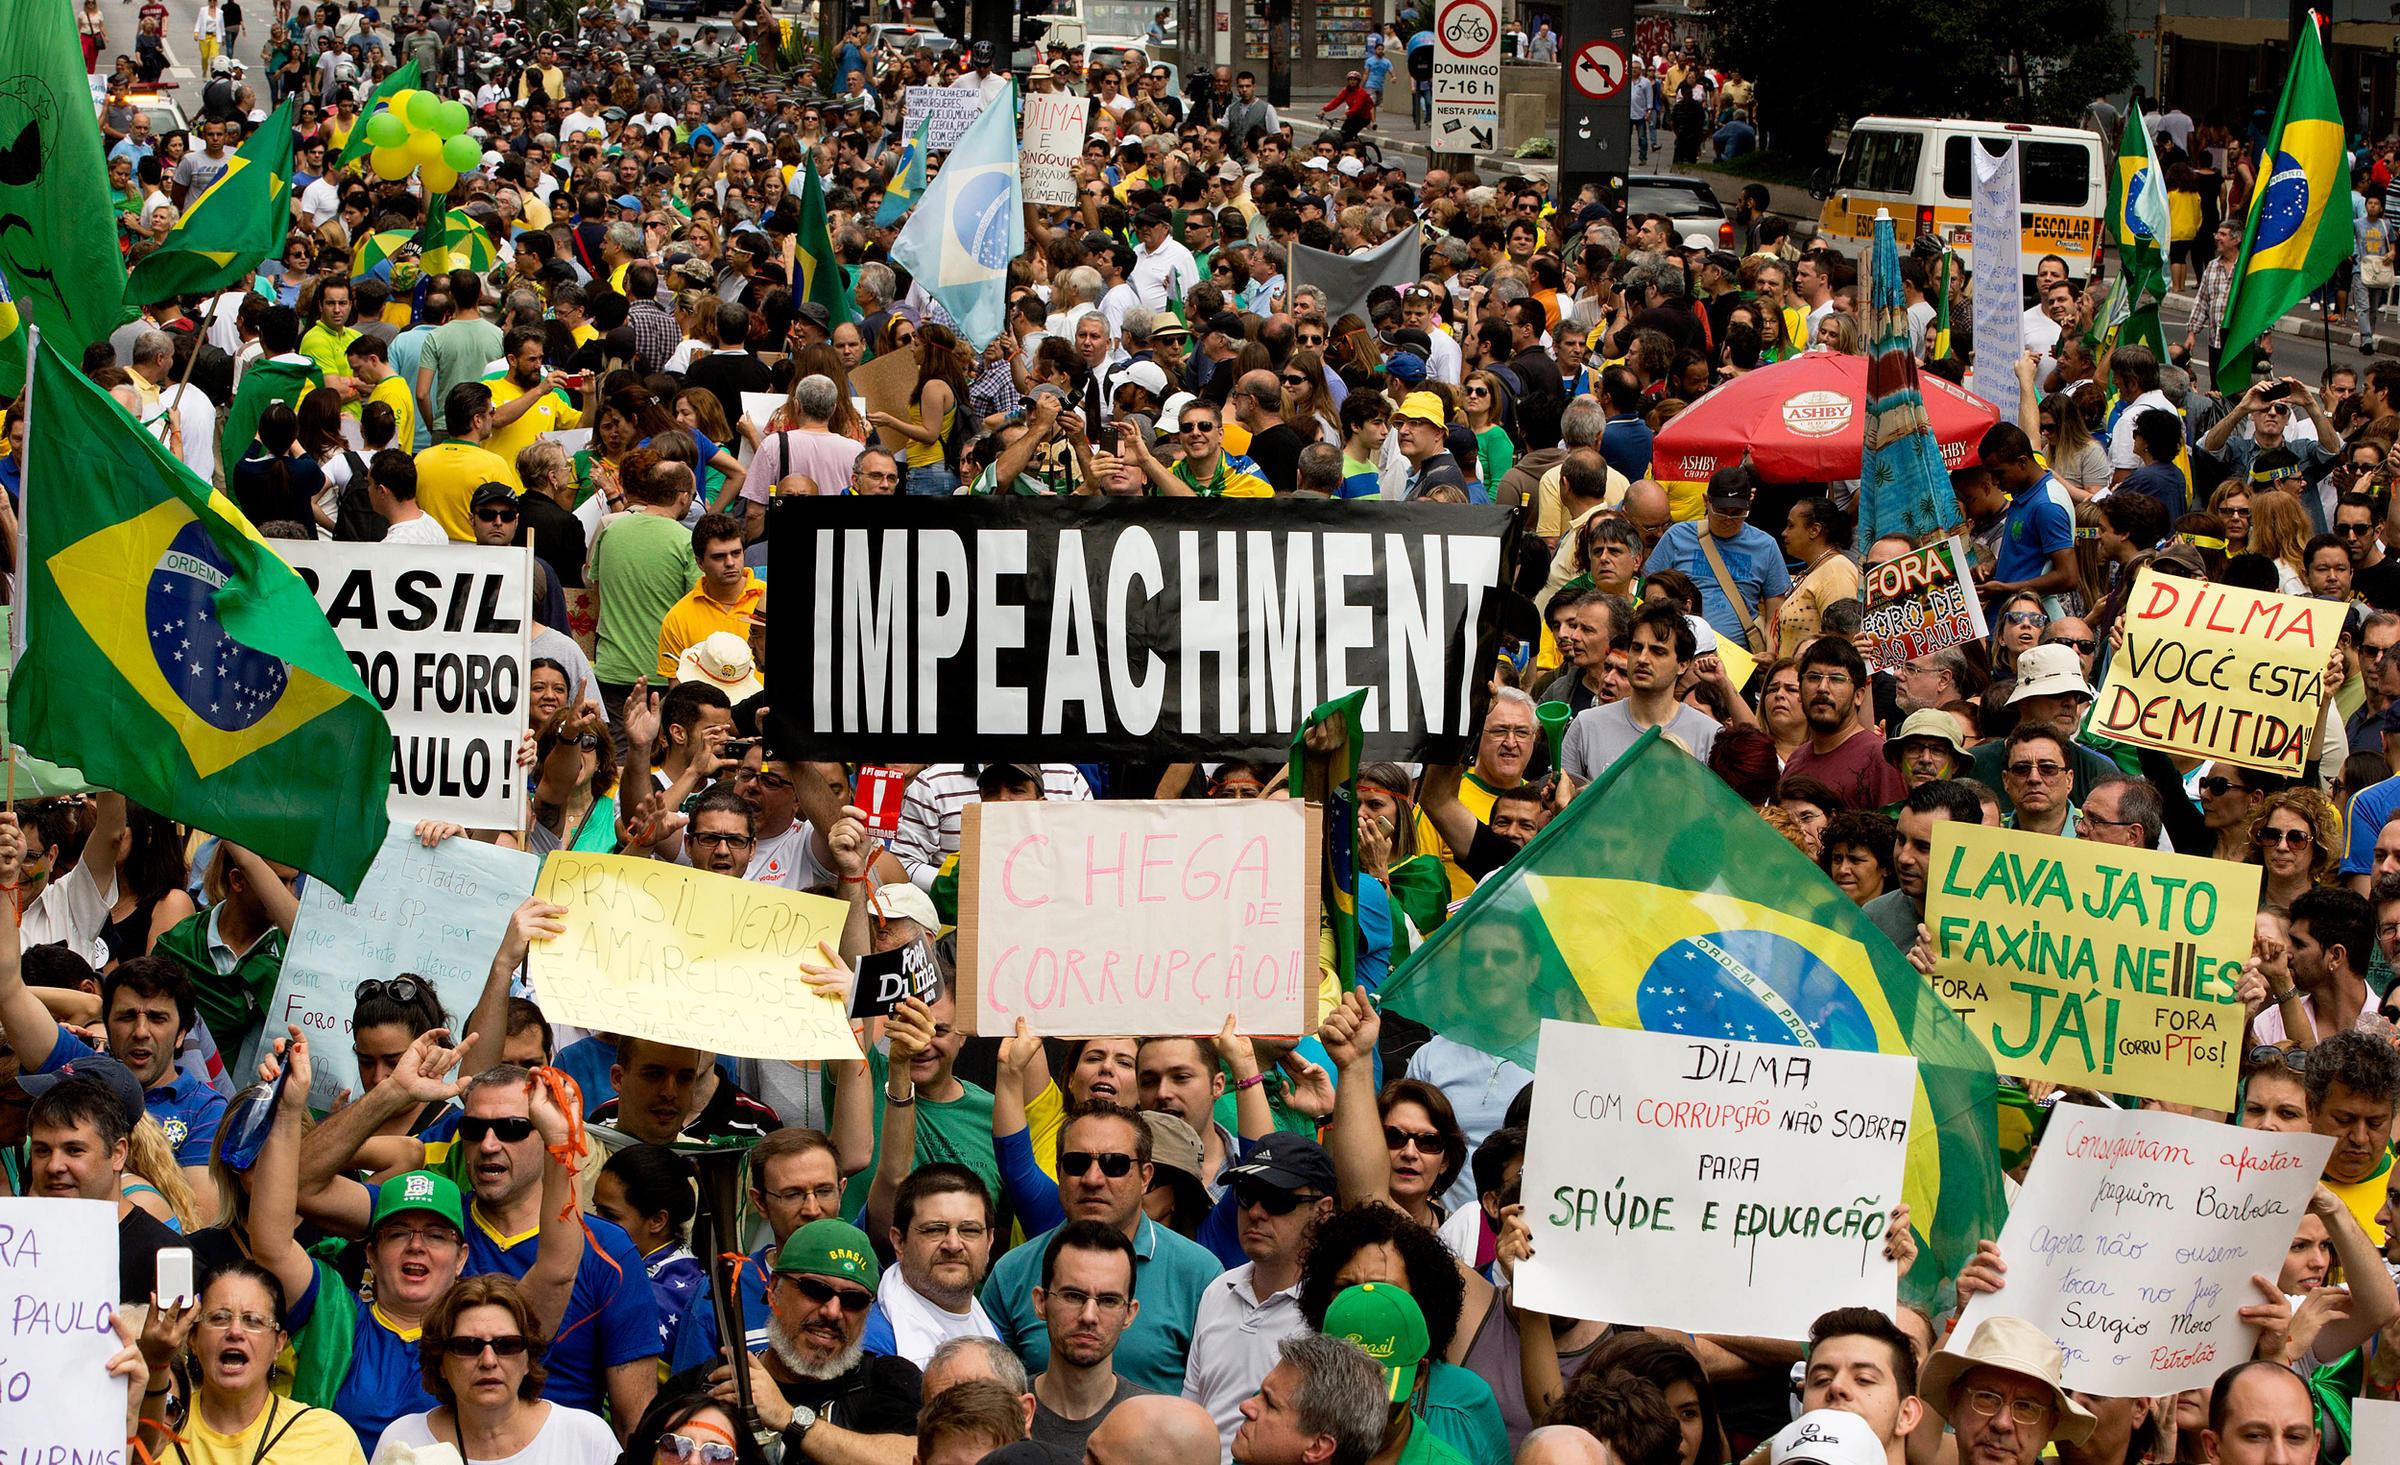 impeachment - photo #38